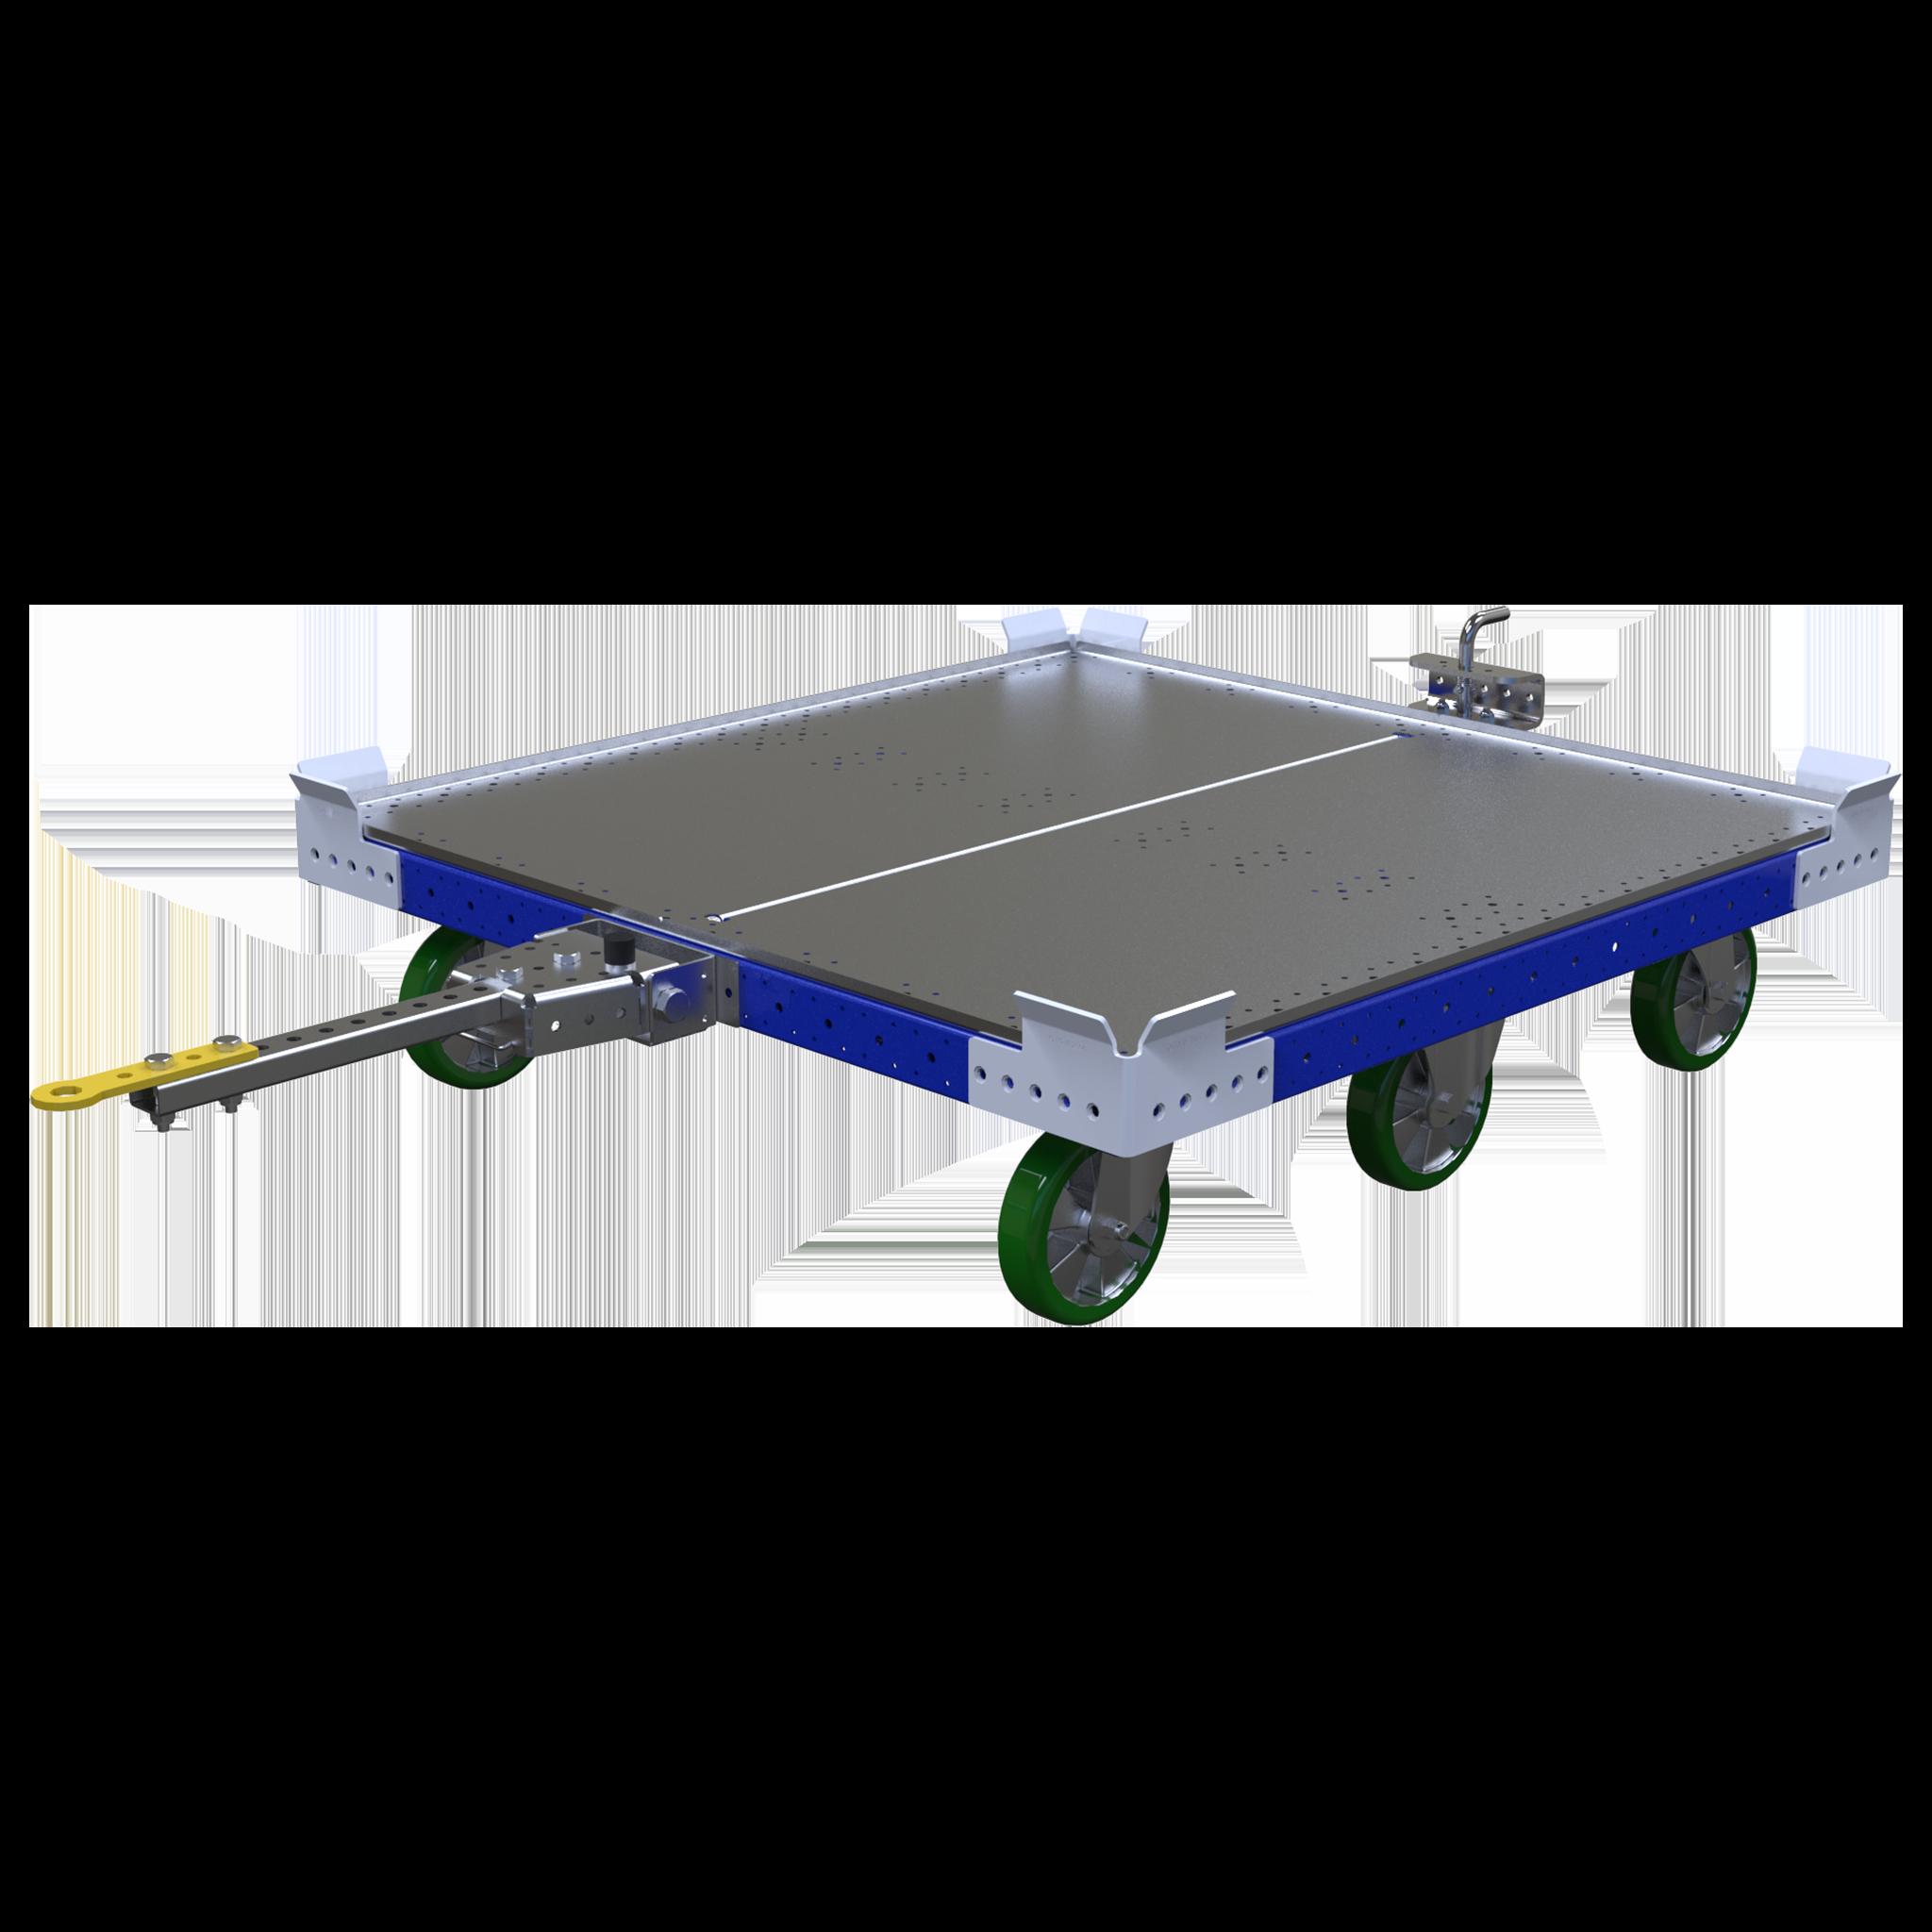 Carro remolcador de plataforma plana - 1260 x 1260 mm